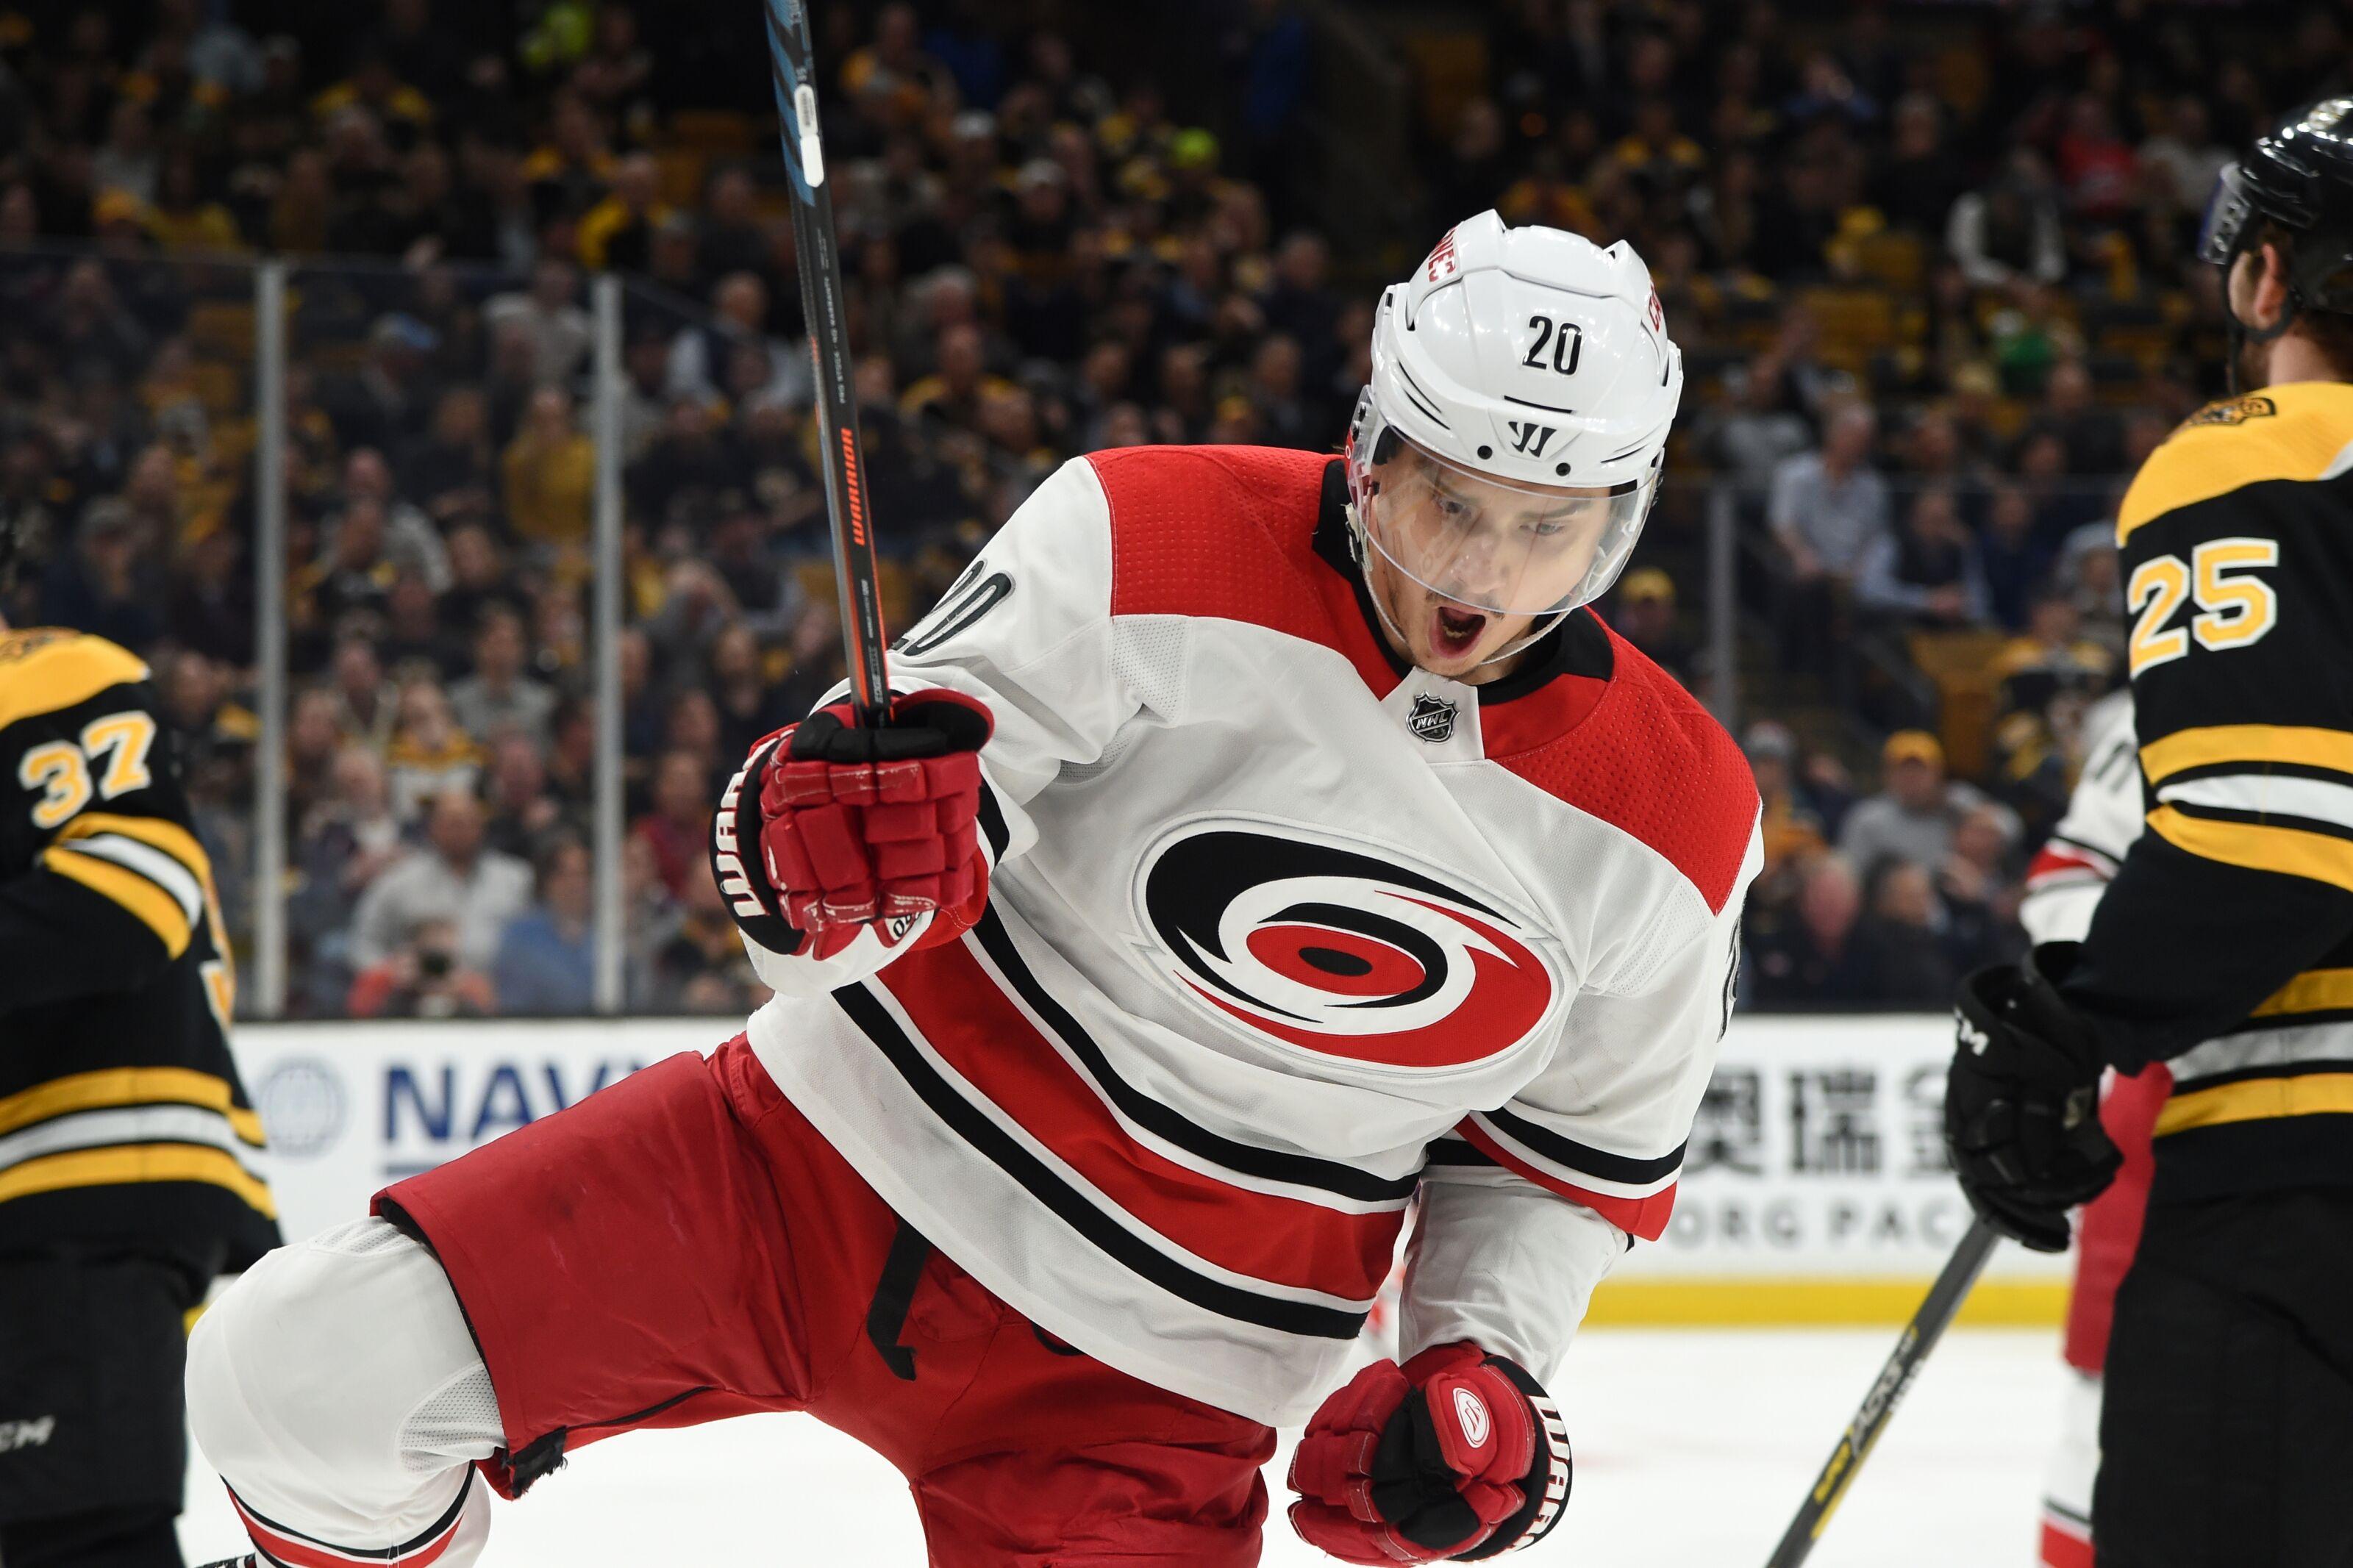 Carolina Hurricanes: Sebastian Aho Ranks Among Top NHL Centers